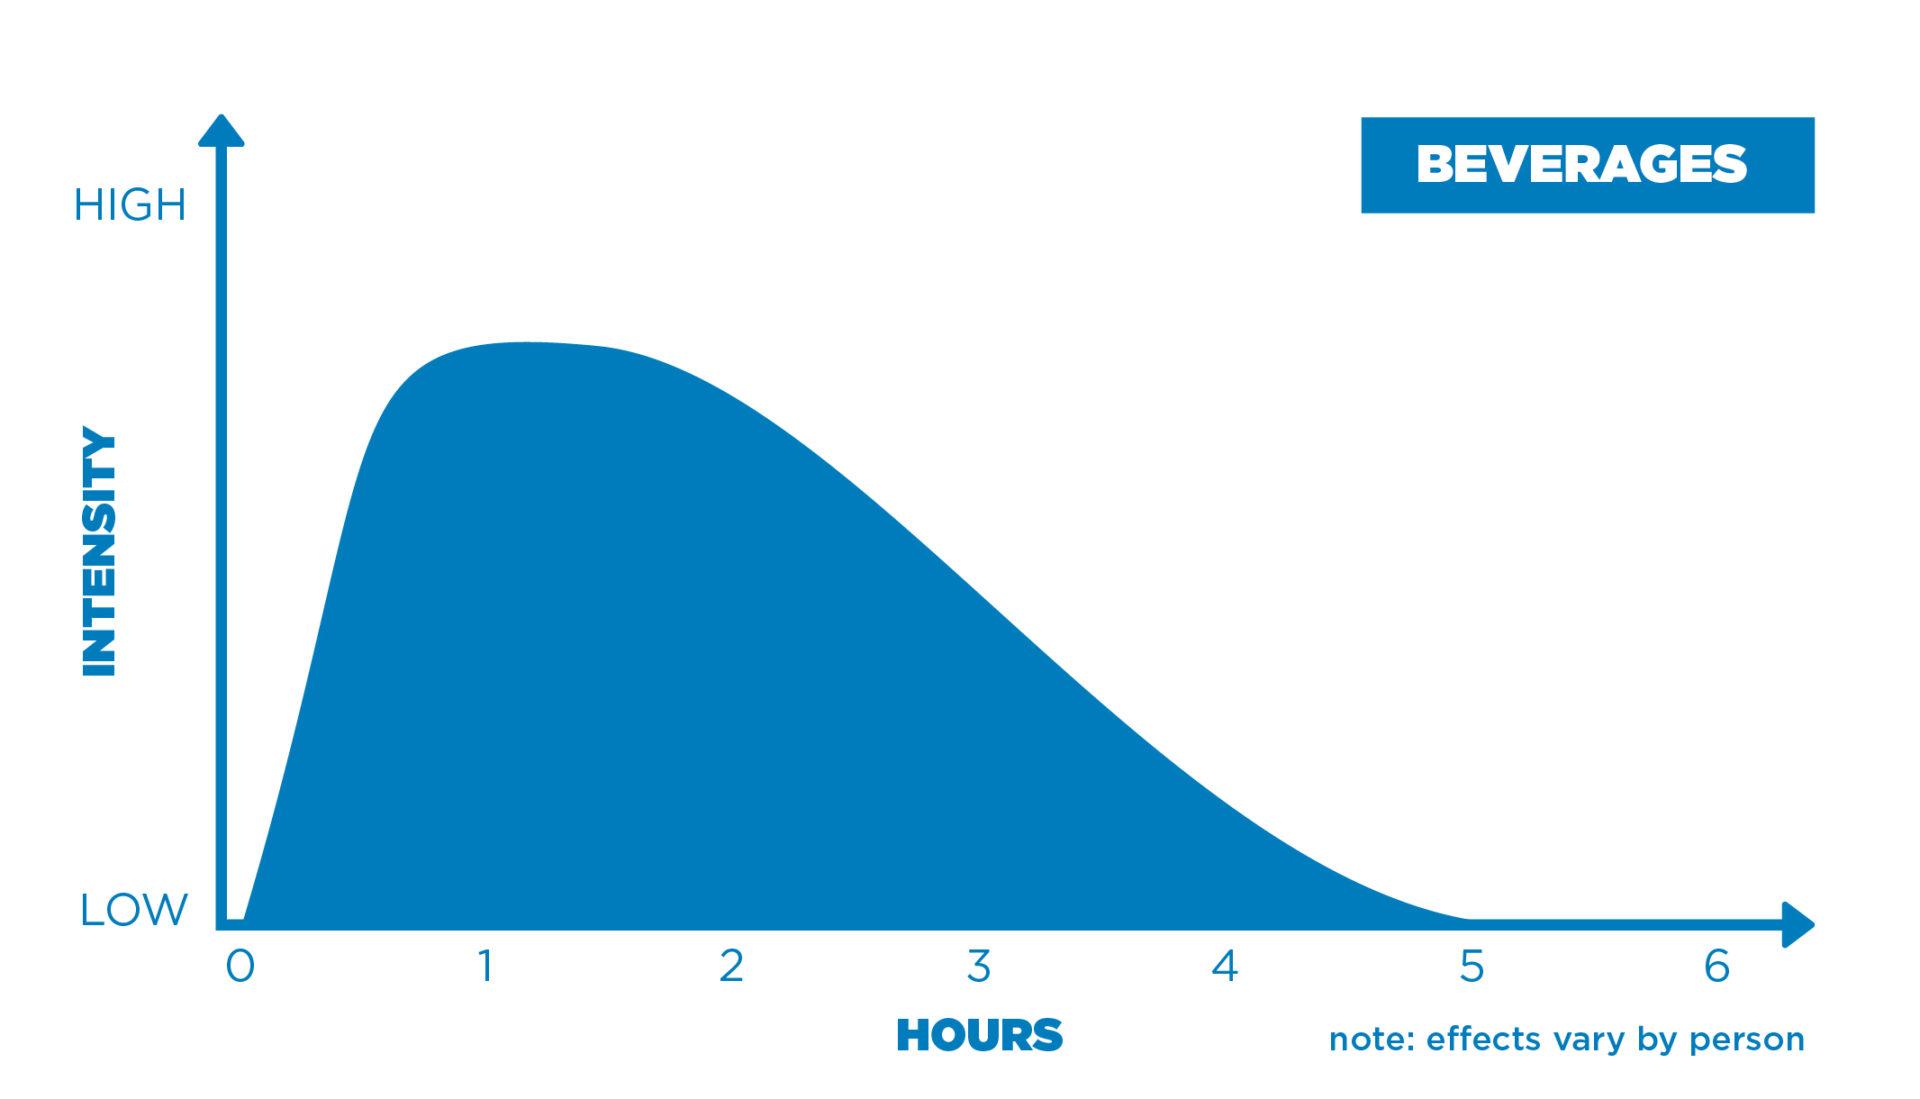 Beverage intensity chart